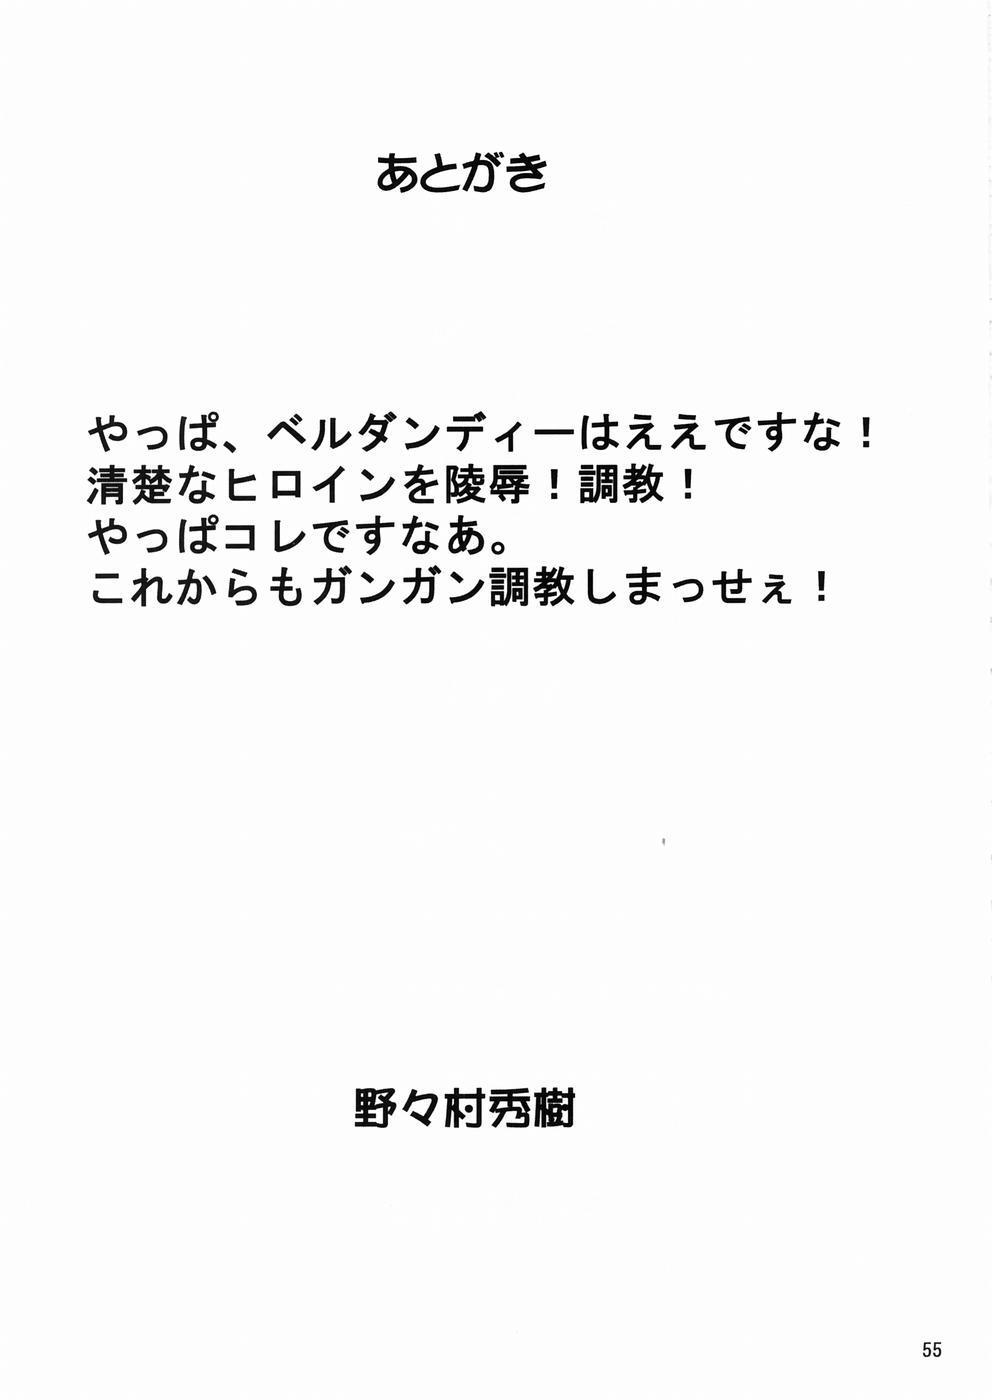 Megami-sama Ryoujoku 2 | Goddess Assault 2 54